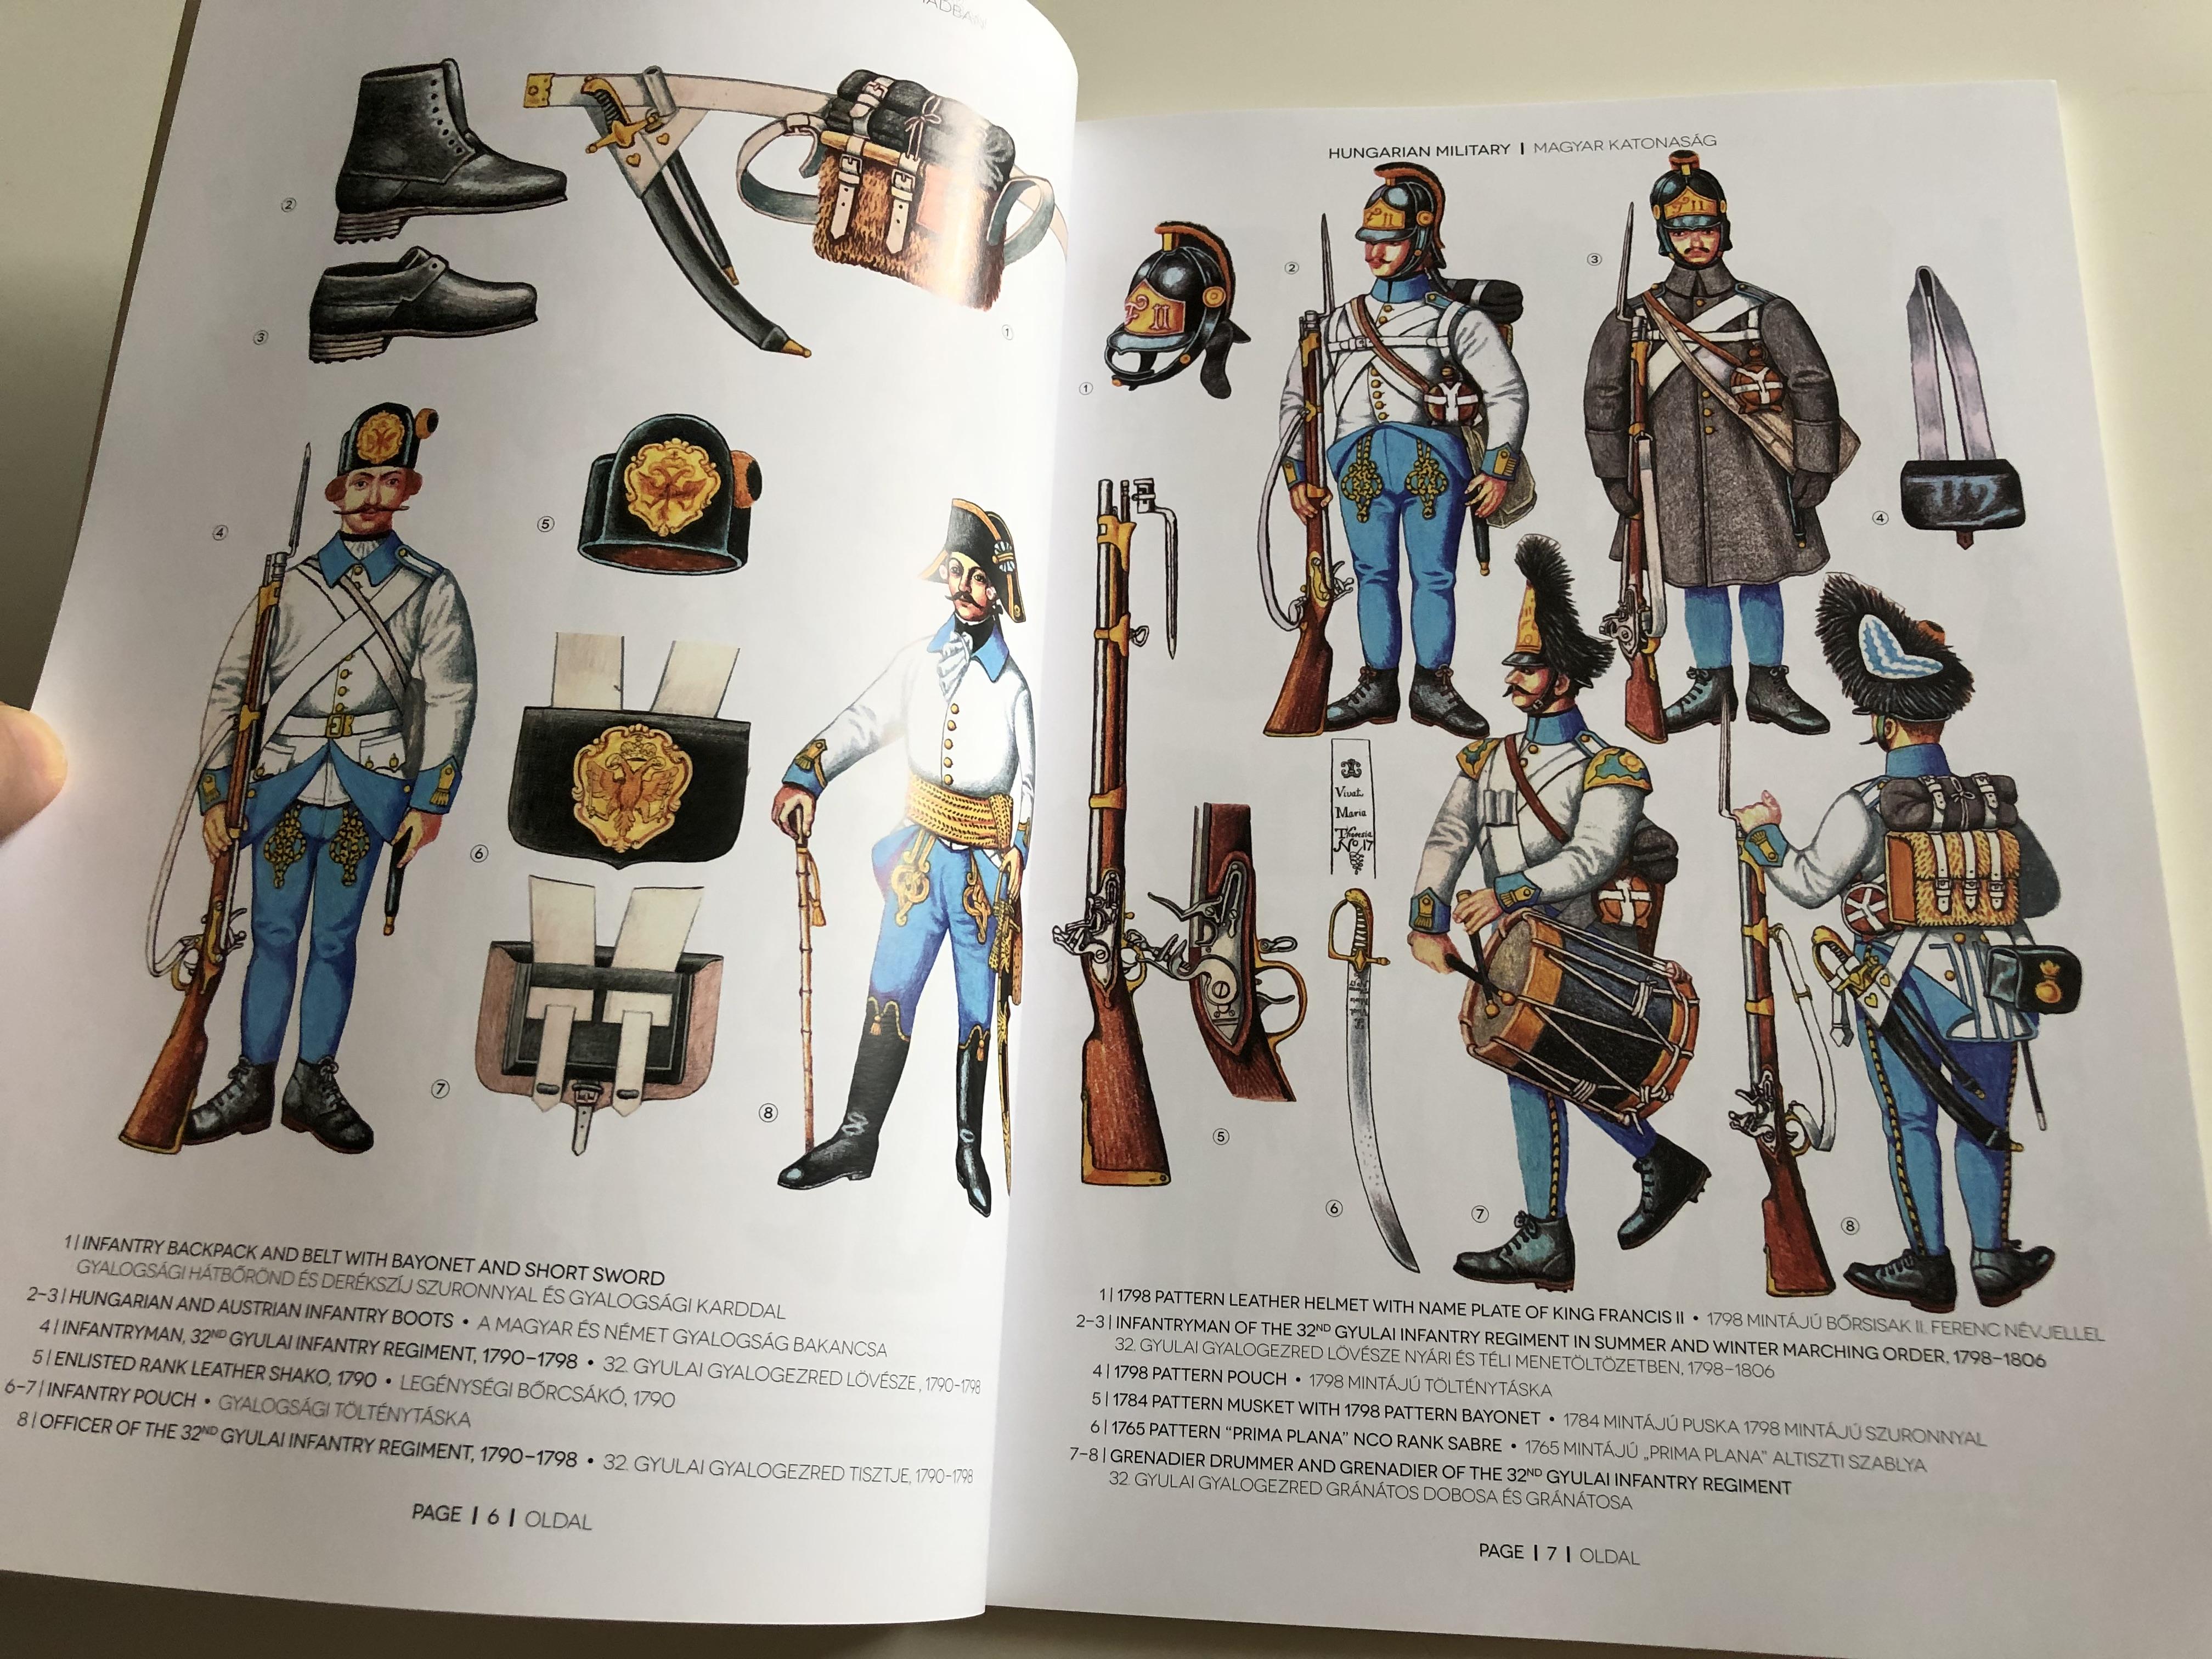 hungarian-military-1768-1848-by-gy-z-somogyi-magyar-katonas-g-1768-1848-a-millennium-in-the-military-egy-ezred-v-hadban-paperback-2013-hm-zr-nyi-4-.jpg